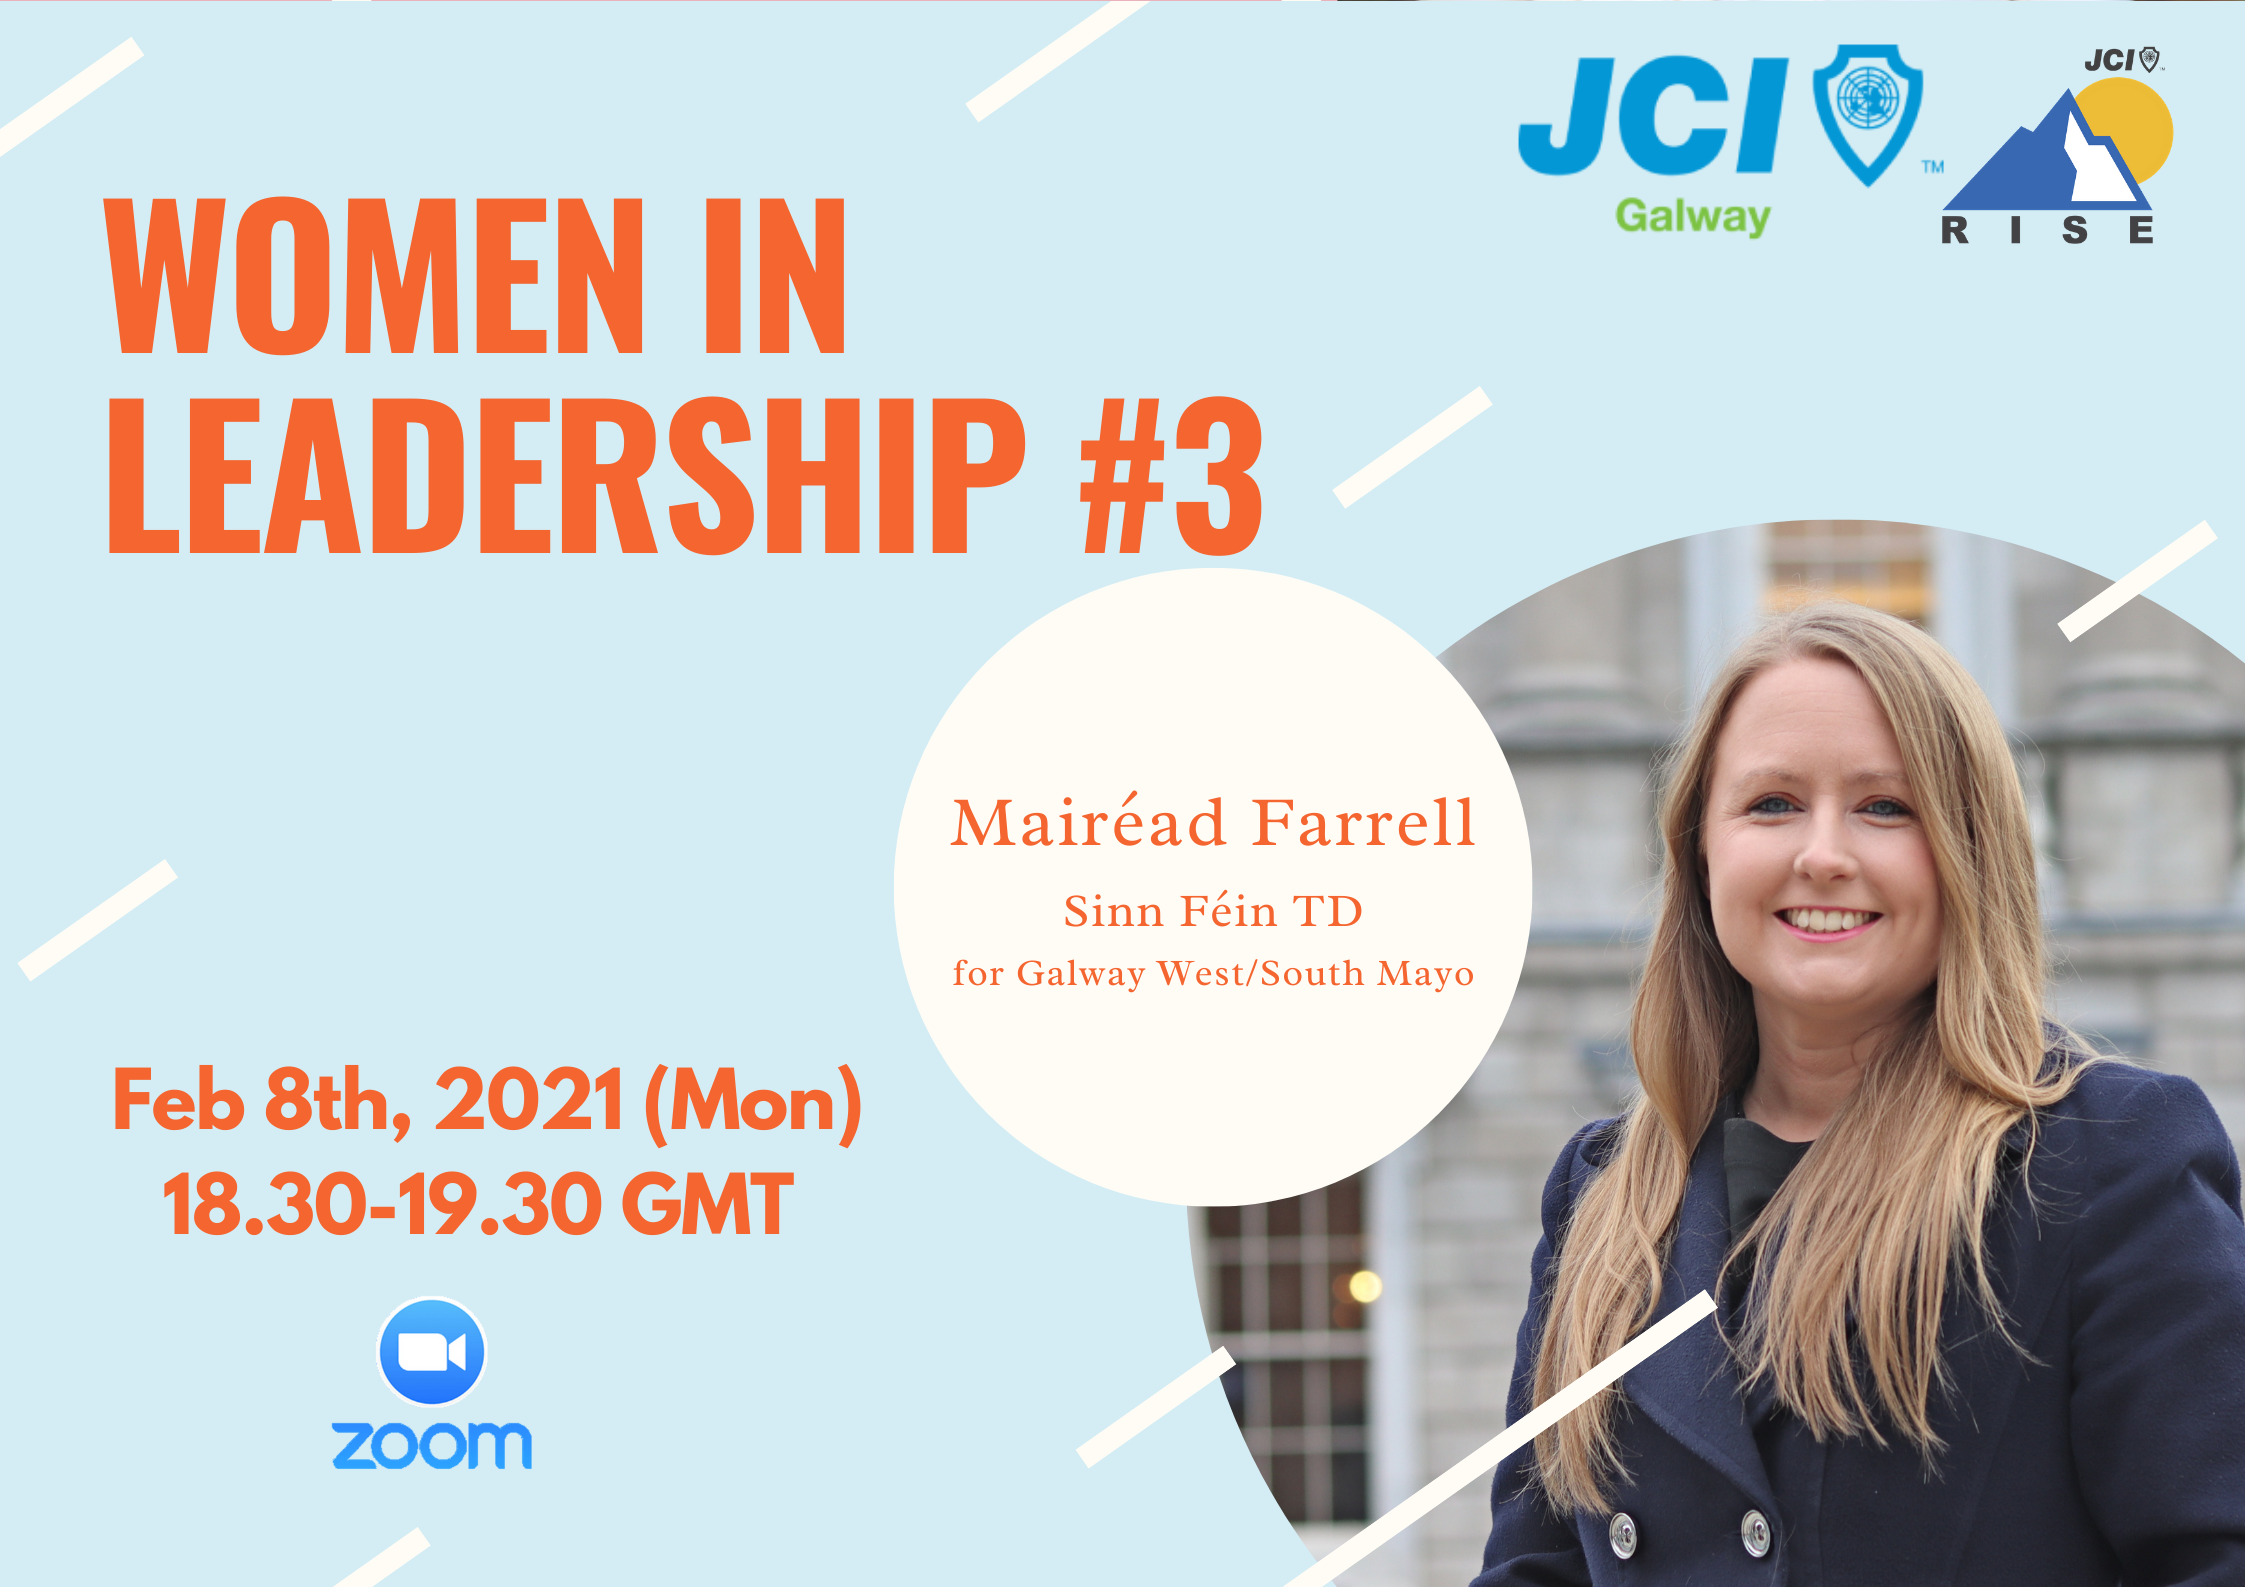 Women in Leadership 3 Presenting Mairead Farrell